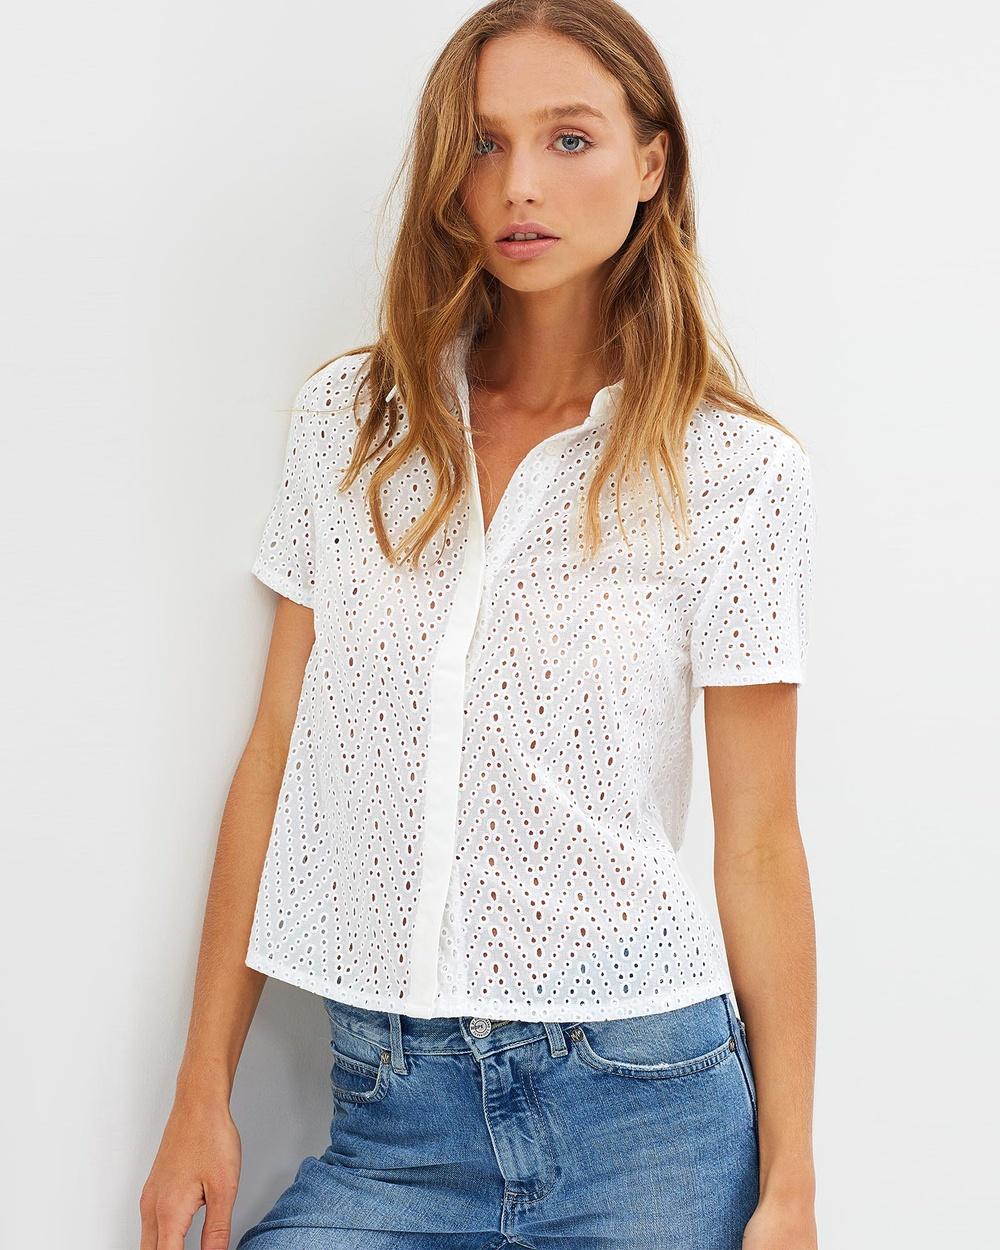 Ryder Lina Lace Shirt Tops White Lina Lace Shirt